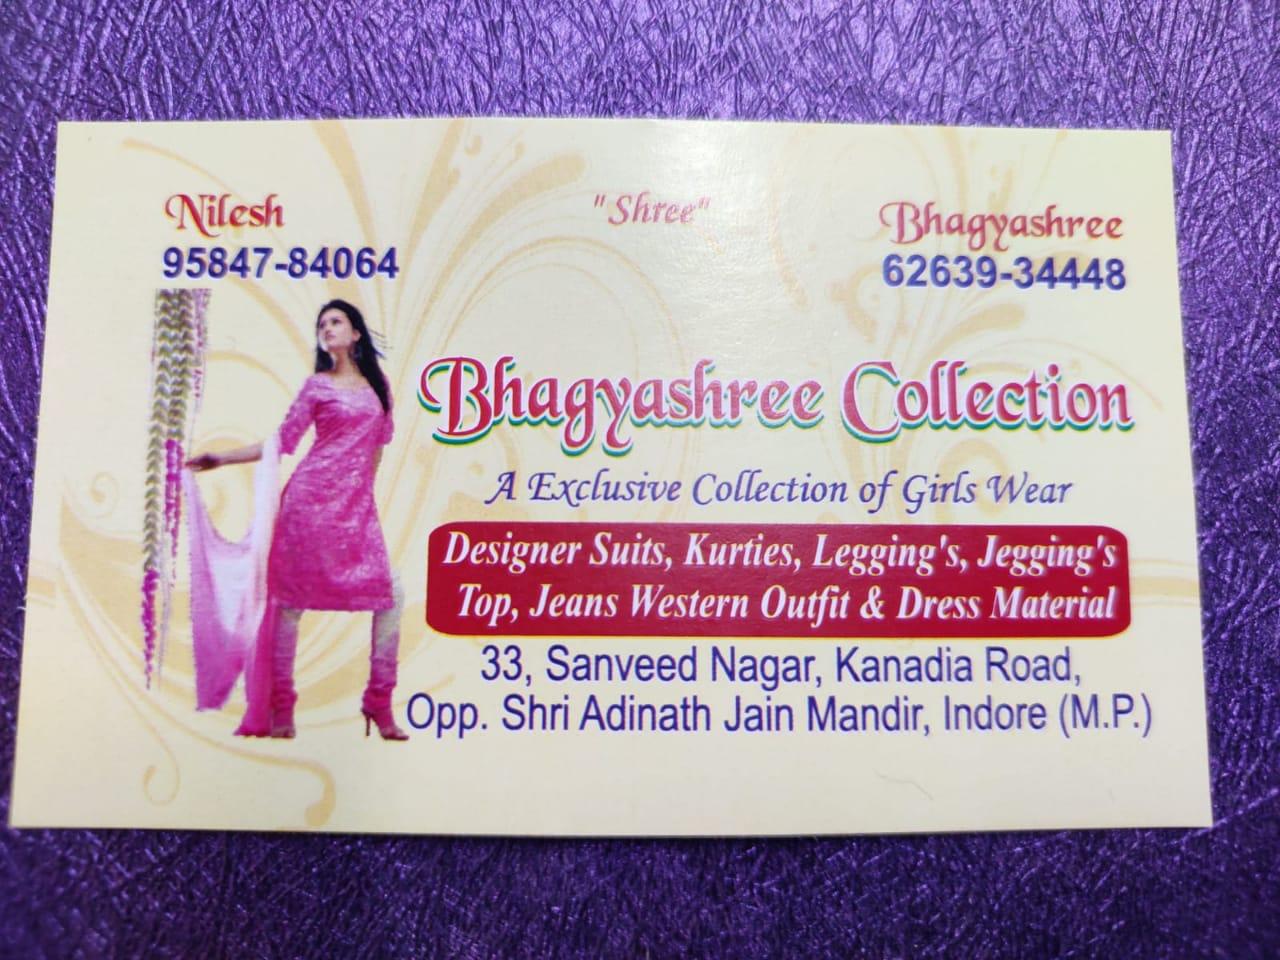 Bhaguashree collection